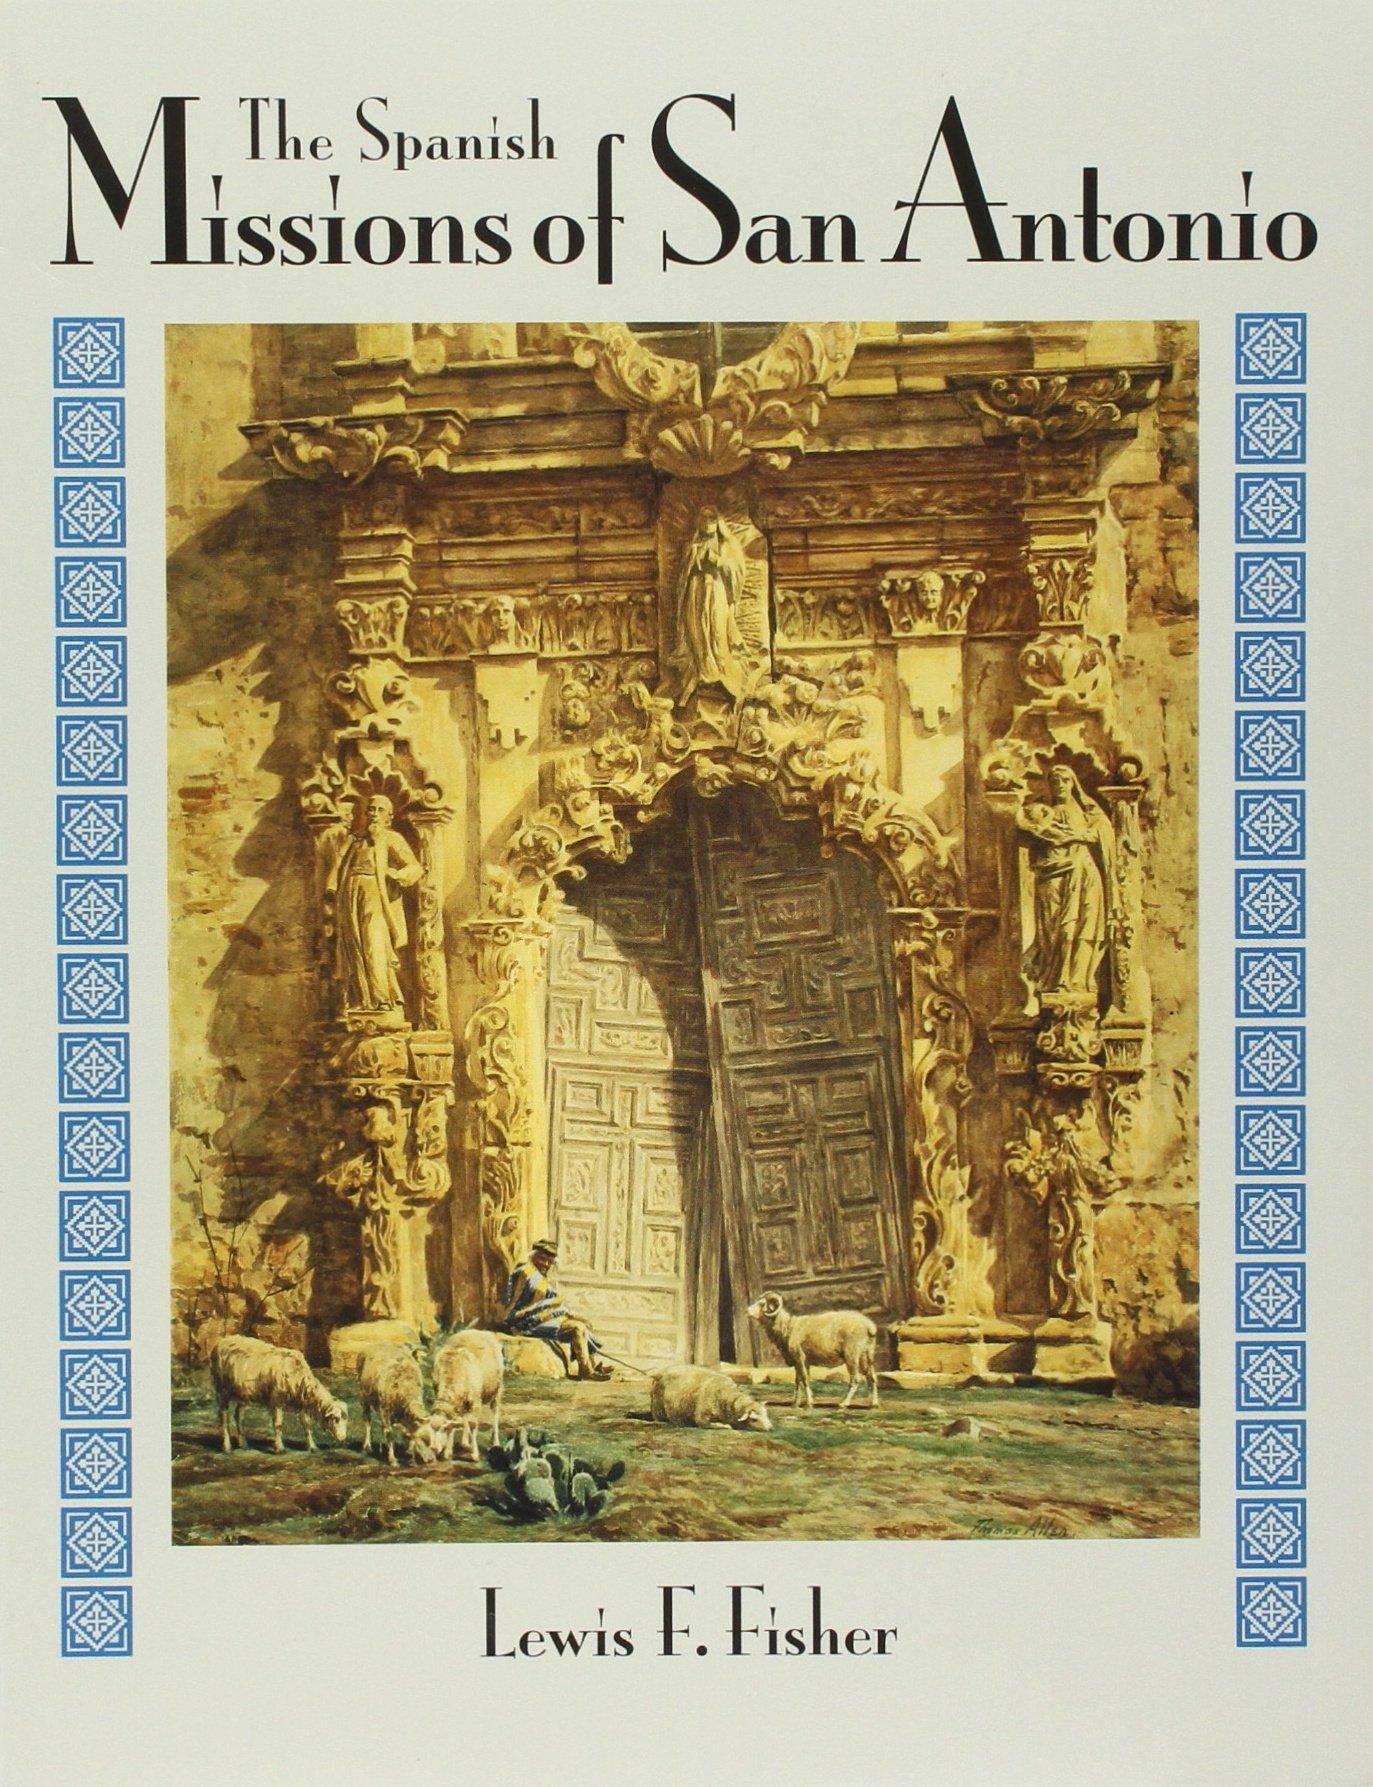 The Spanish Missions of San Antonio